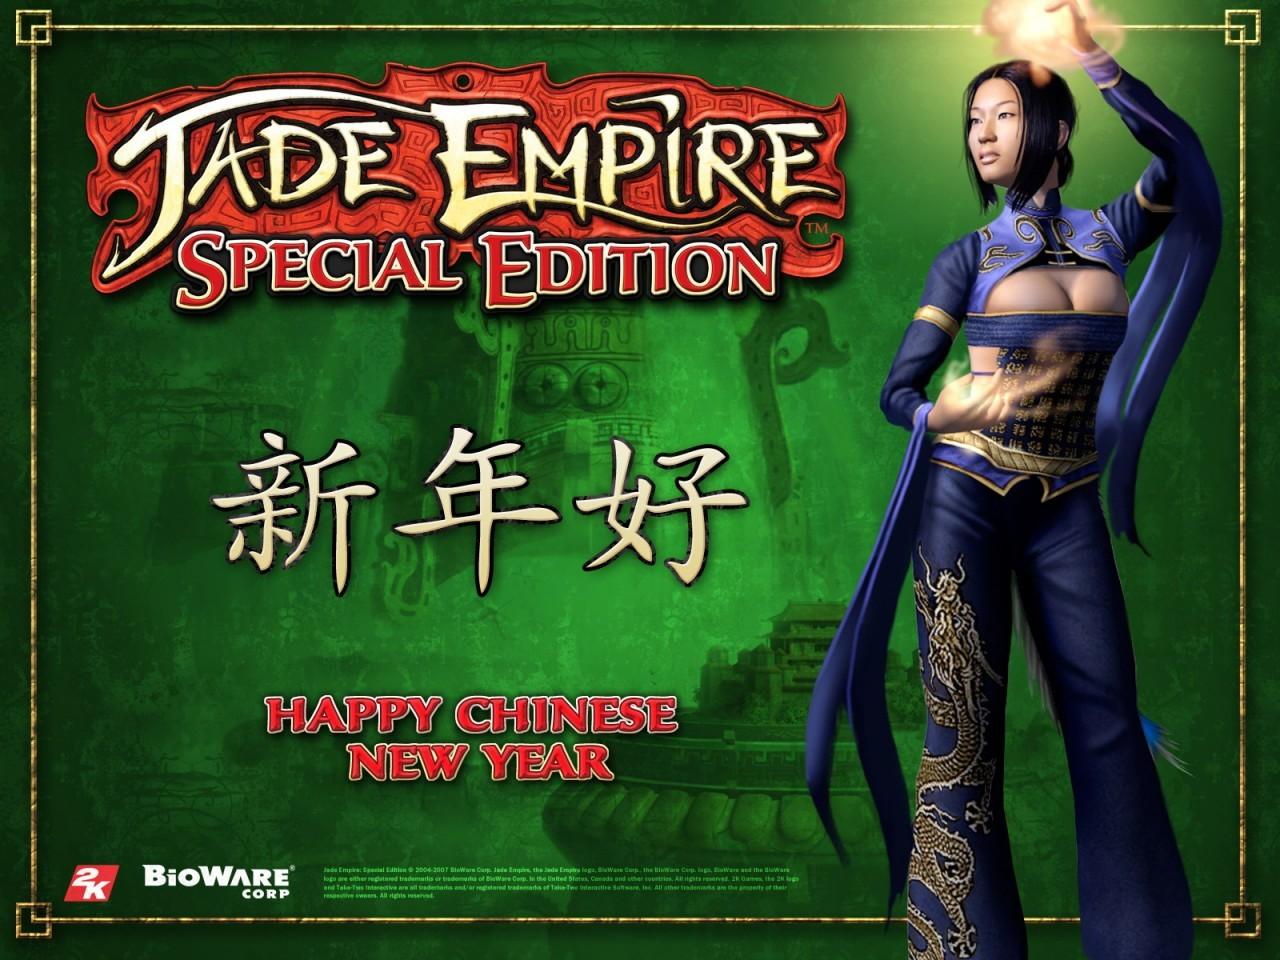 Jade Empire Test